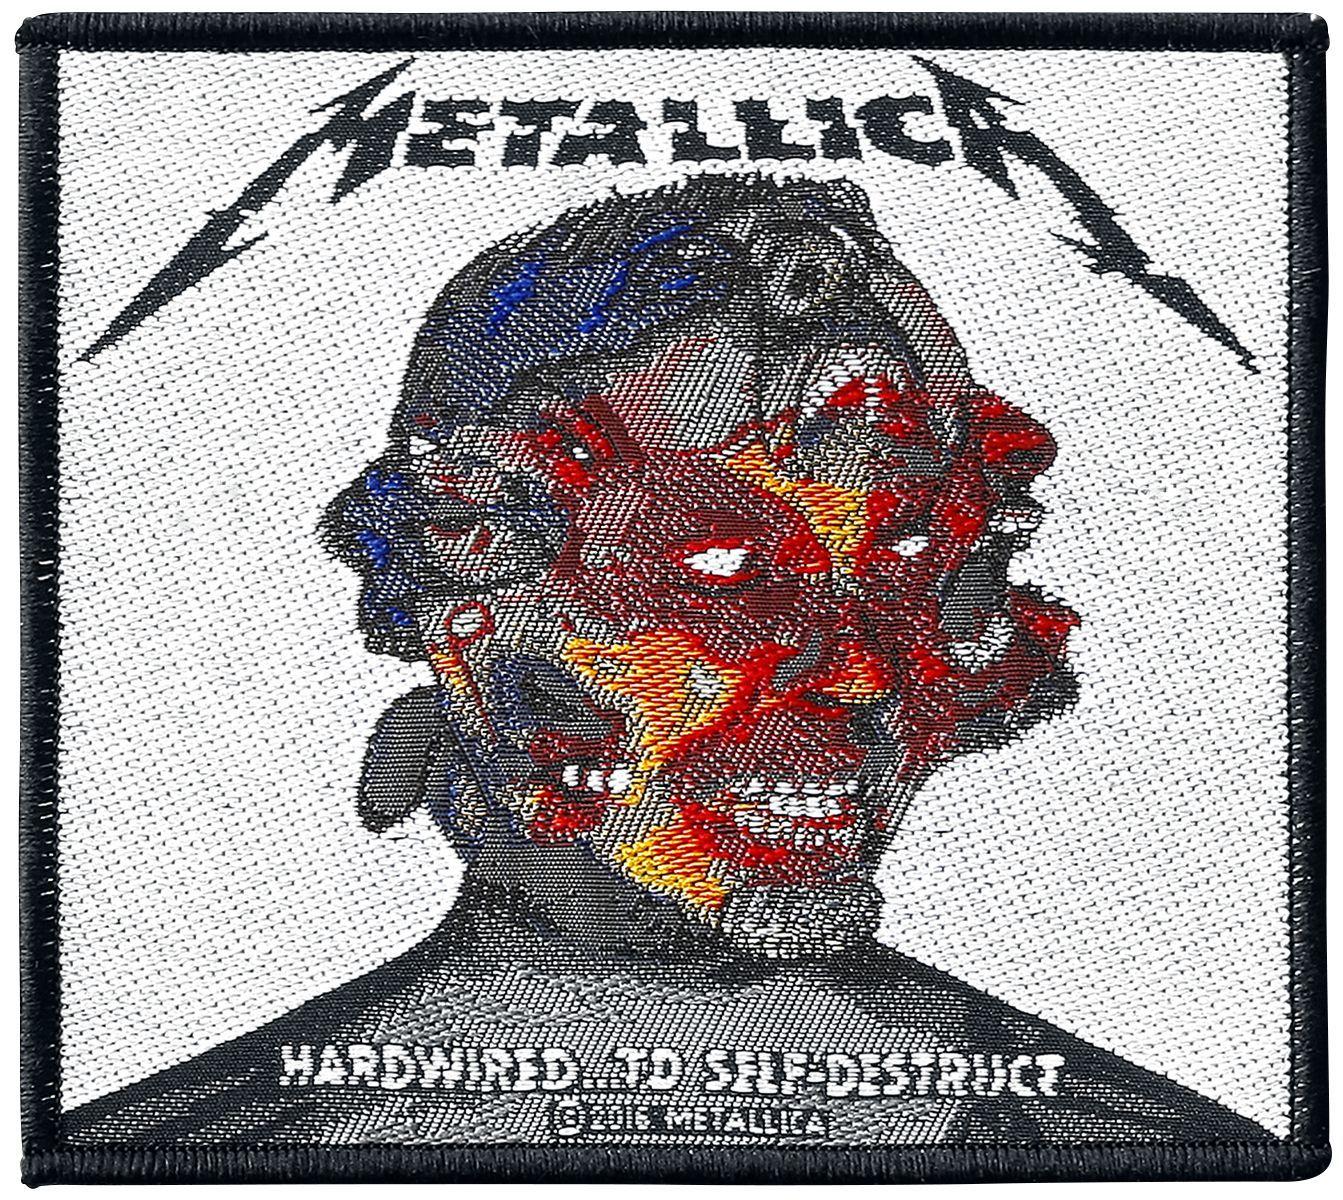 METALLICA Hardwired... To Self-Destruct Patch.jpg